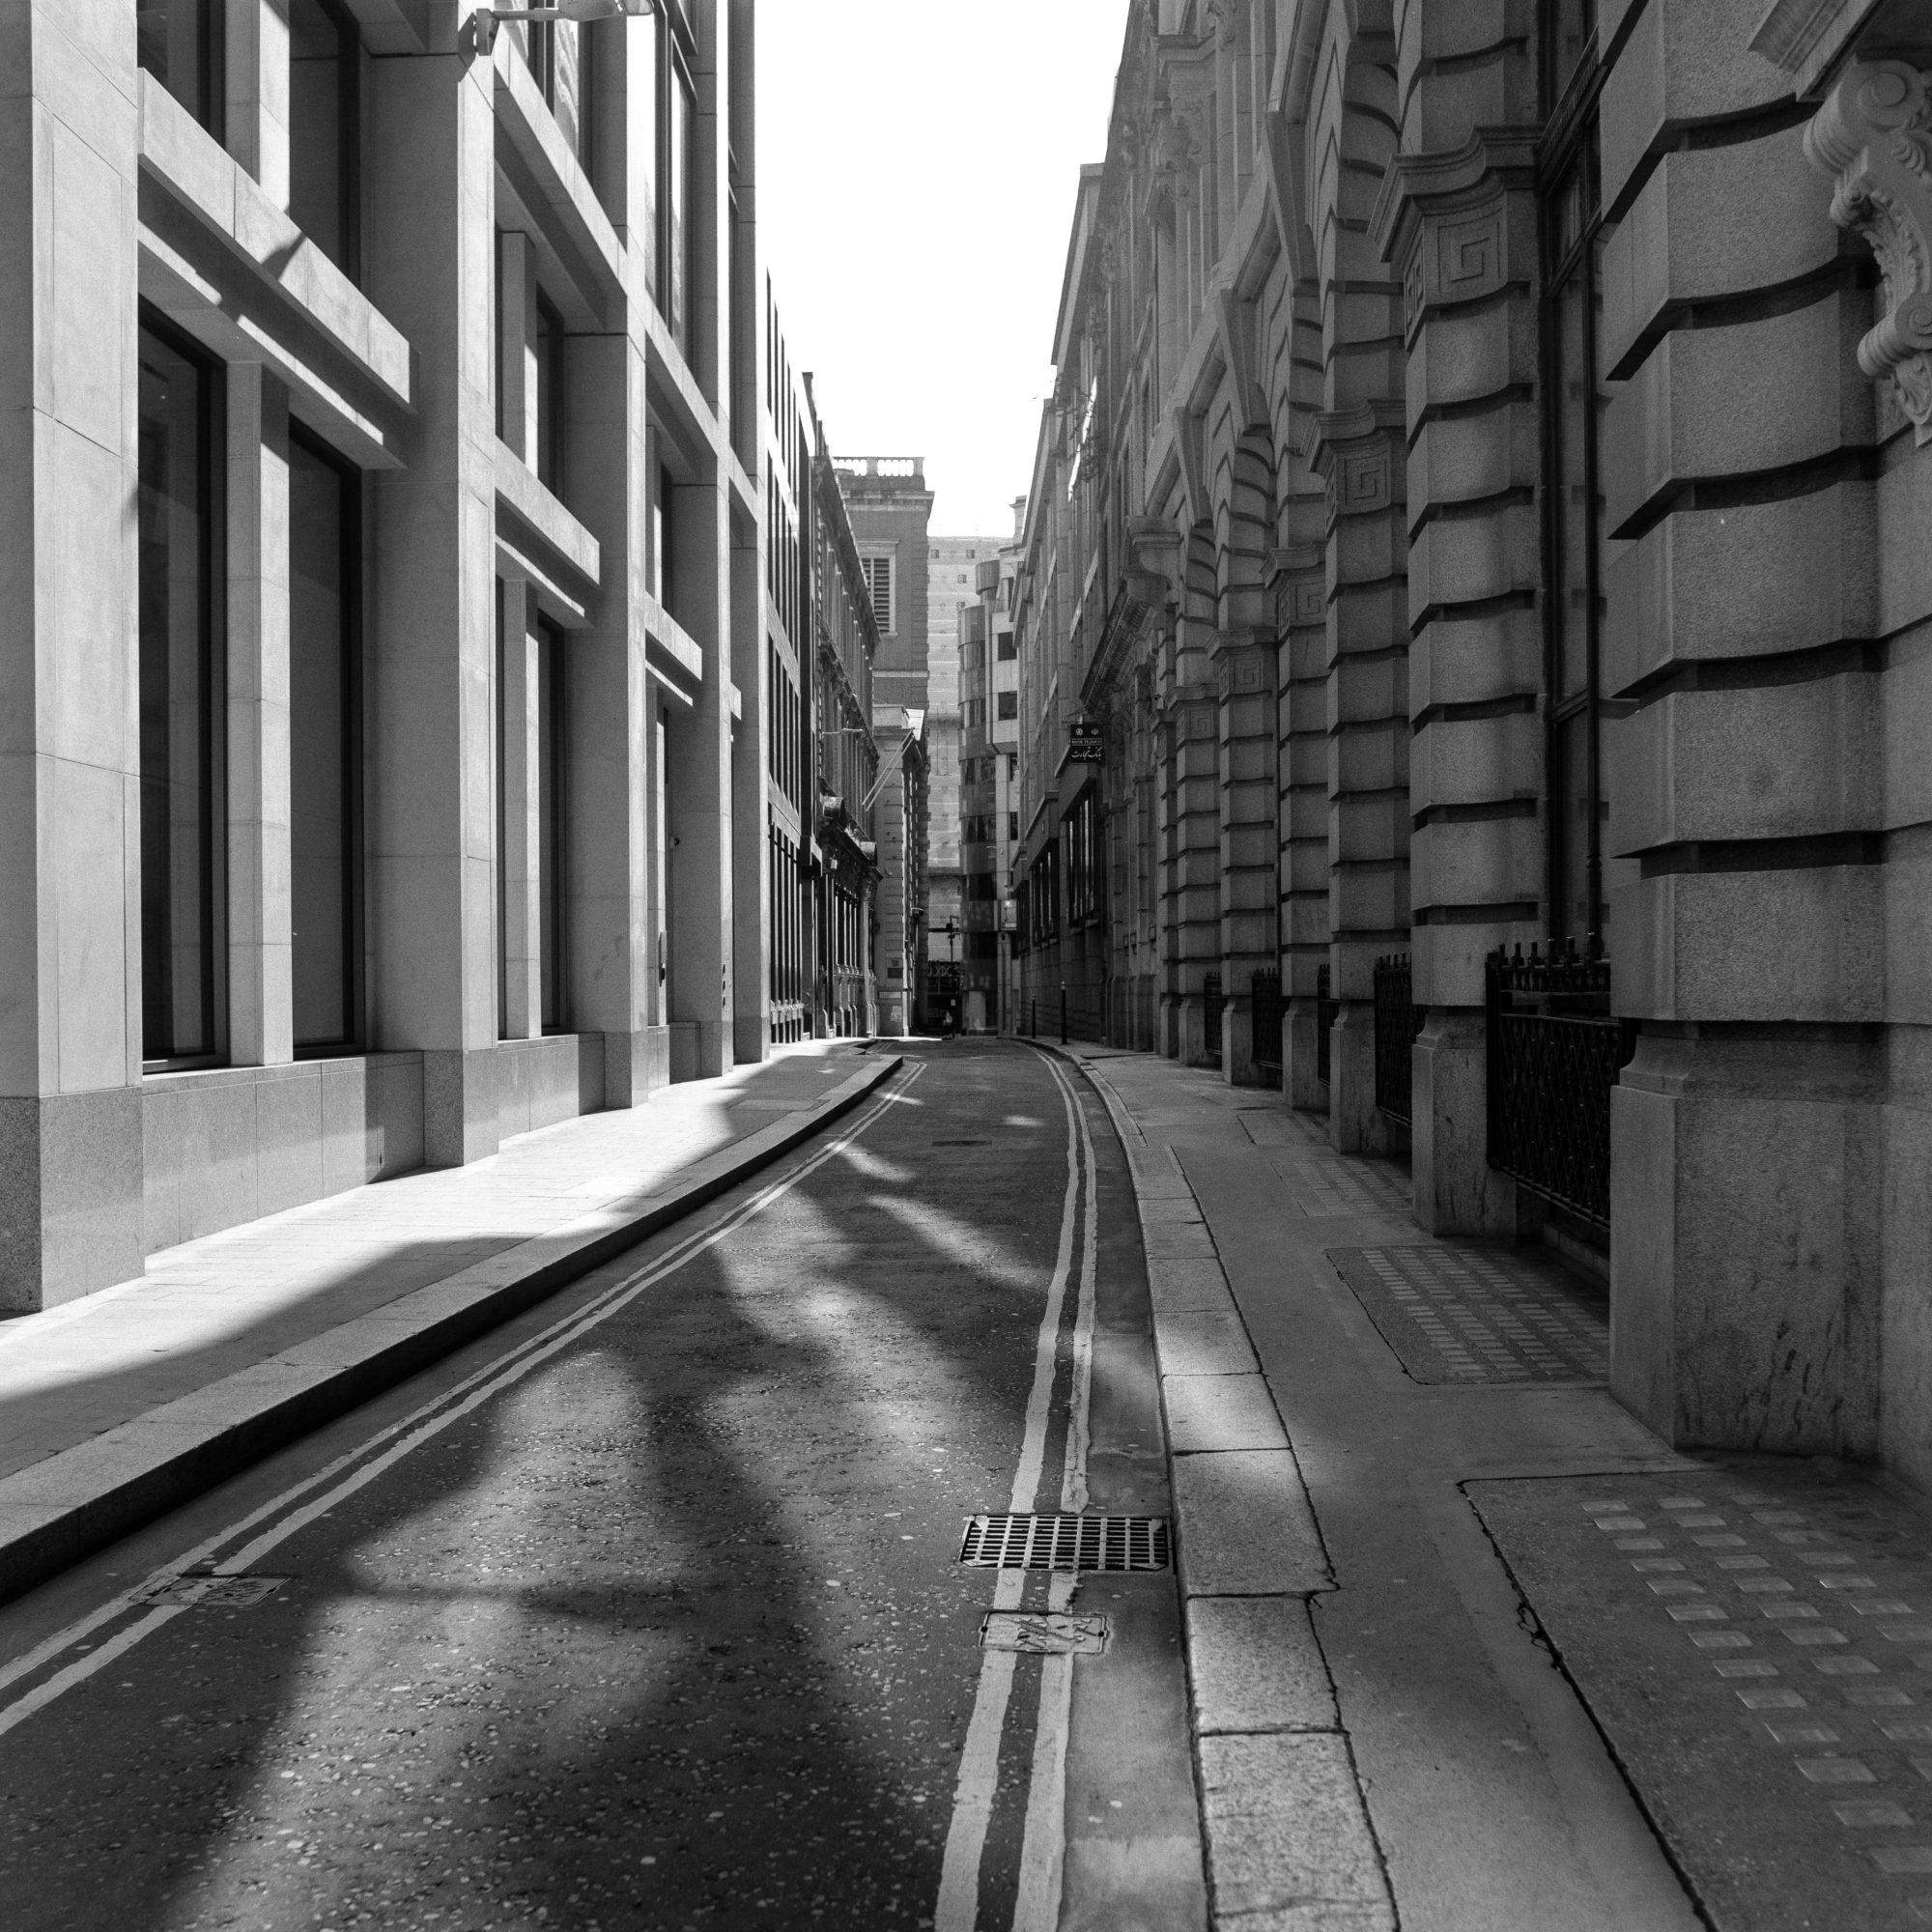 Empty City street (Pic: Giacomo Mantovani)